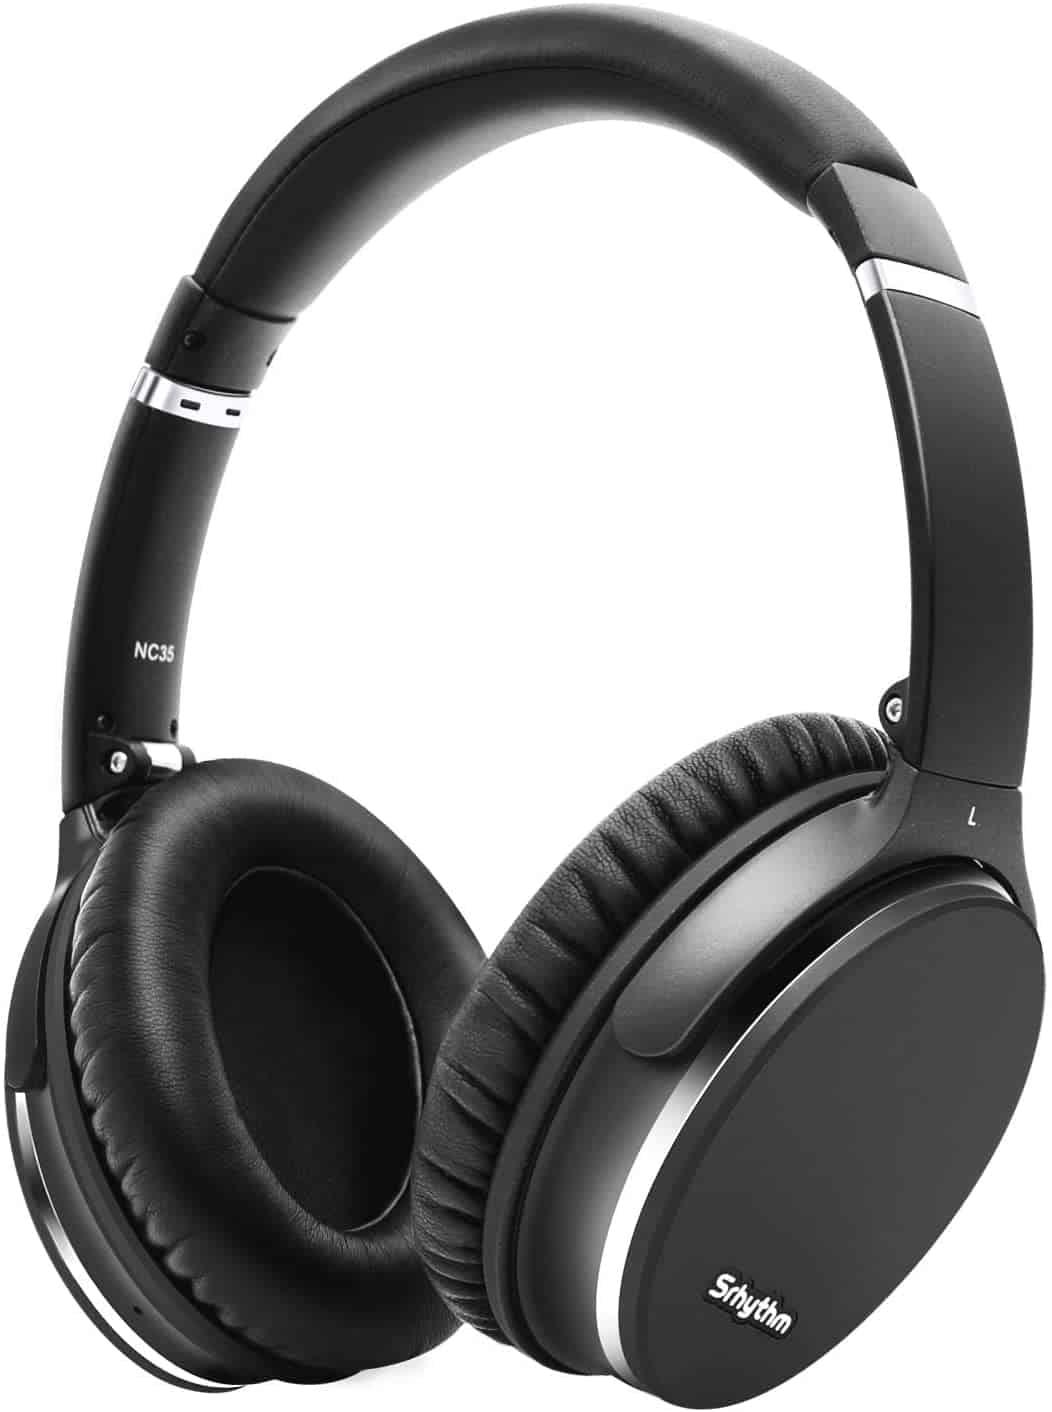 Srhythm NC35 ANC Headphones with Mic